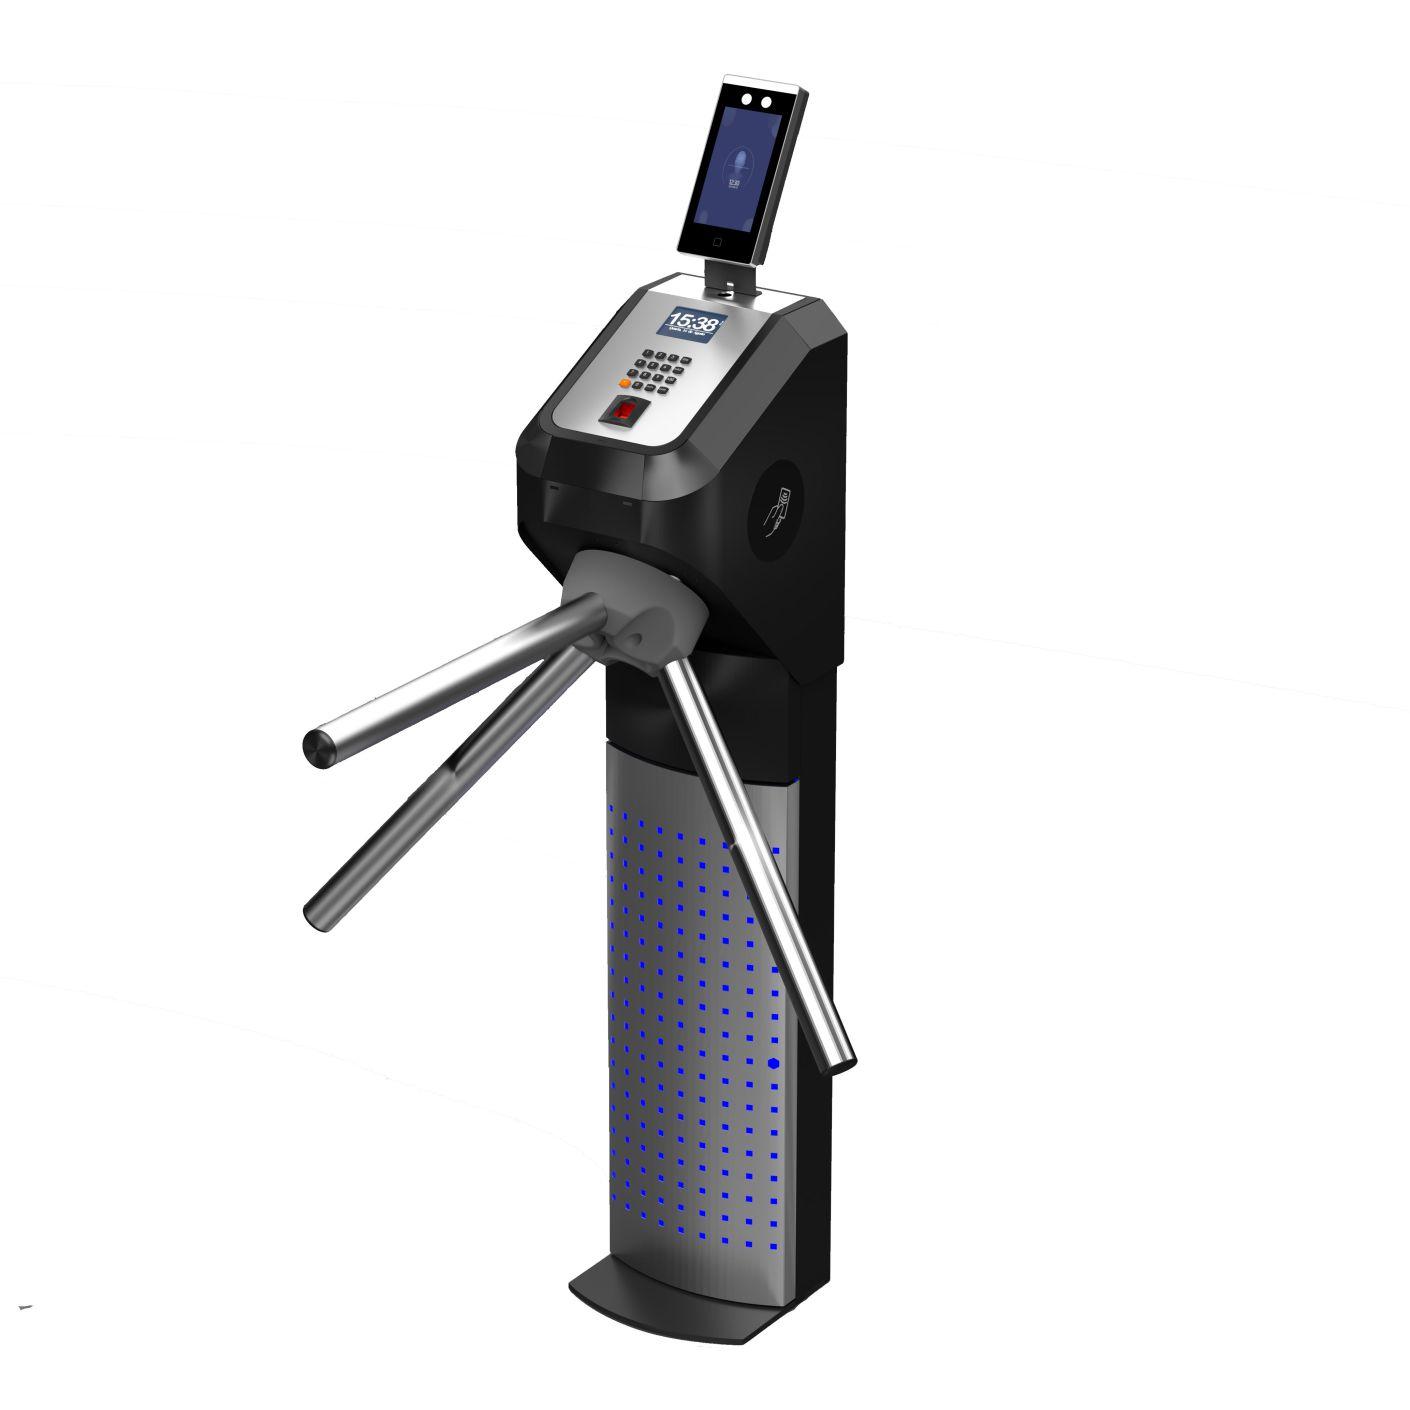 Catraca Eletrônica Biometria Facial Lumen Advance 2000 Faces